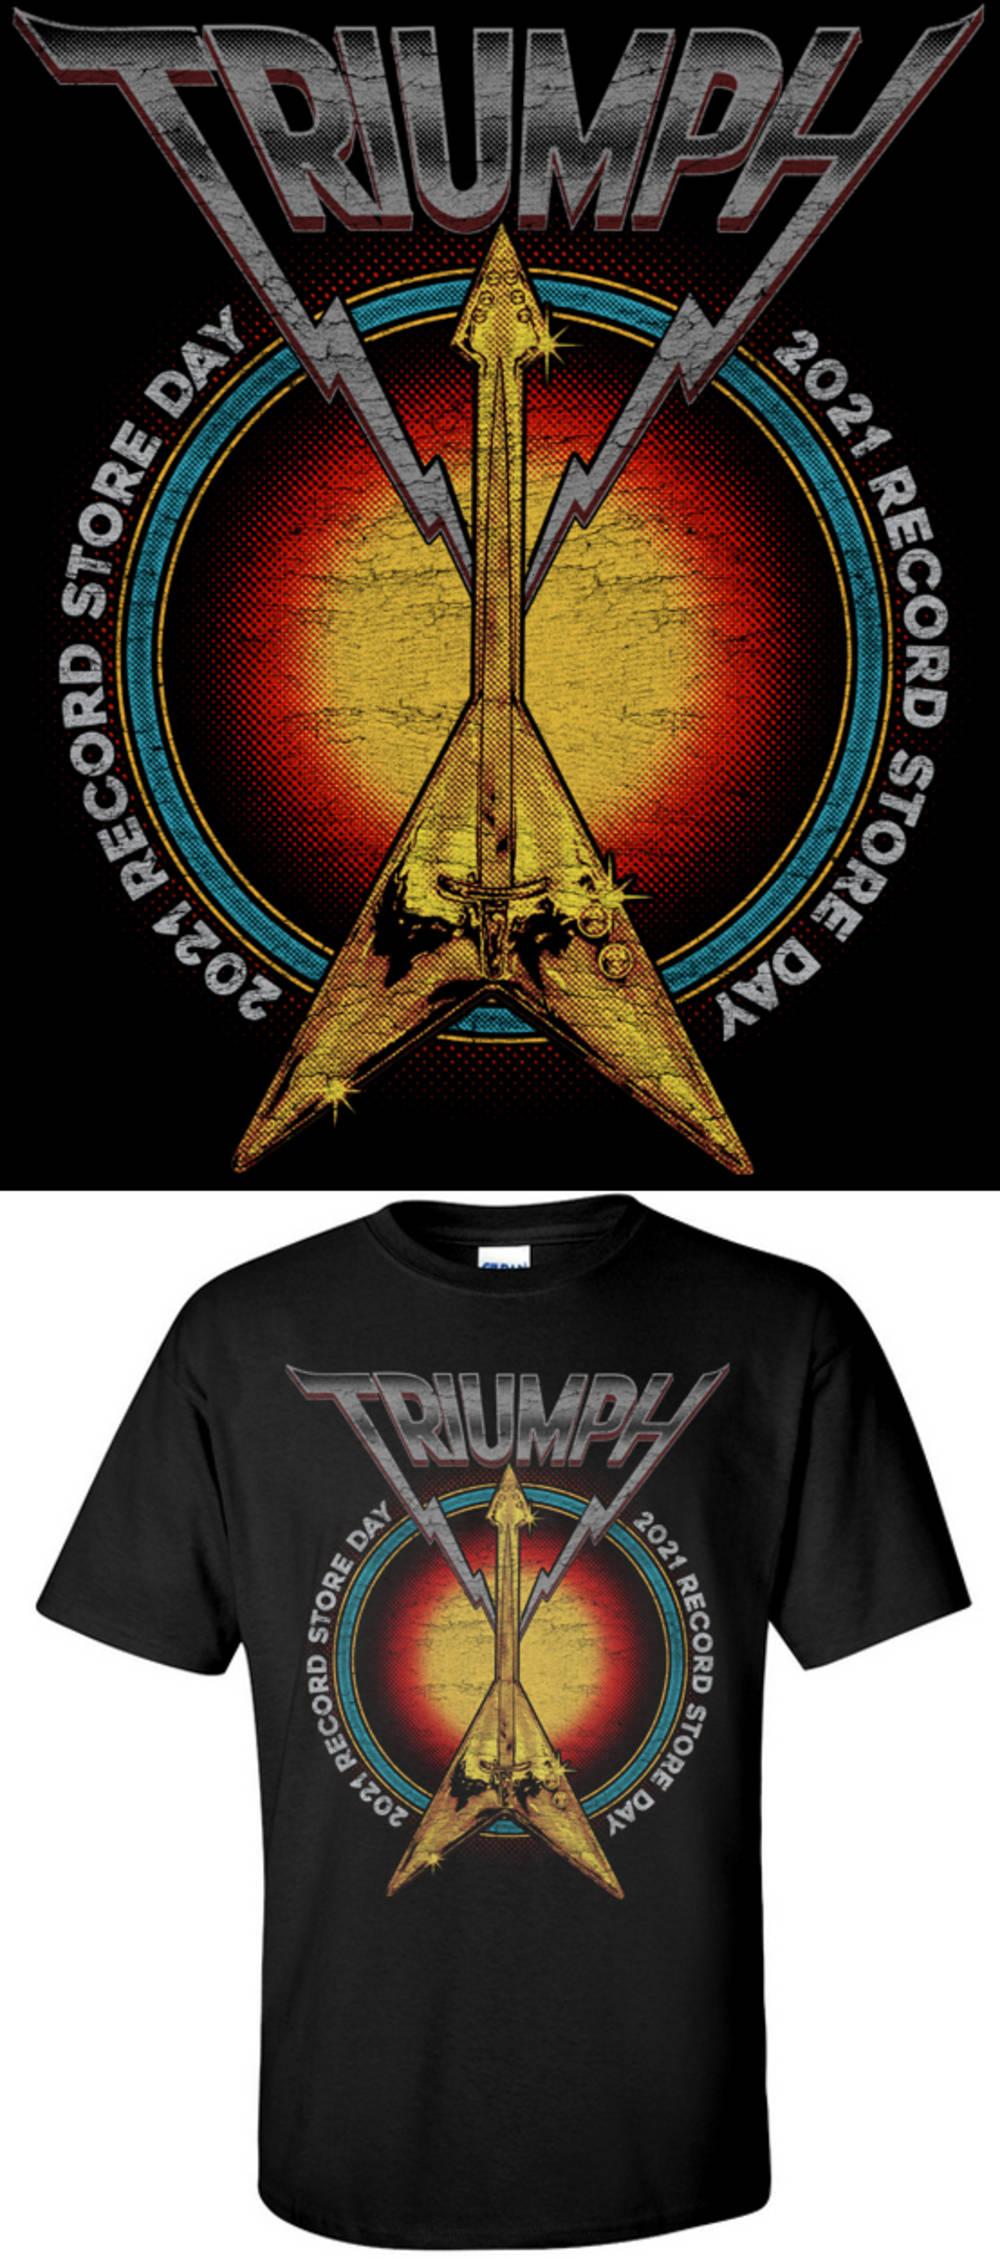 Record Store Day - TRIUMPH RSD 2021 T-SHIRT [UNISEX S]